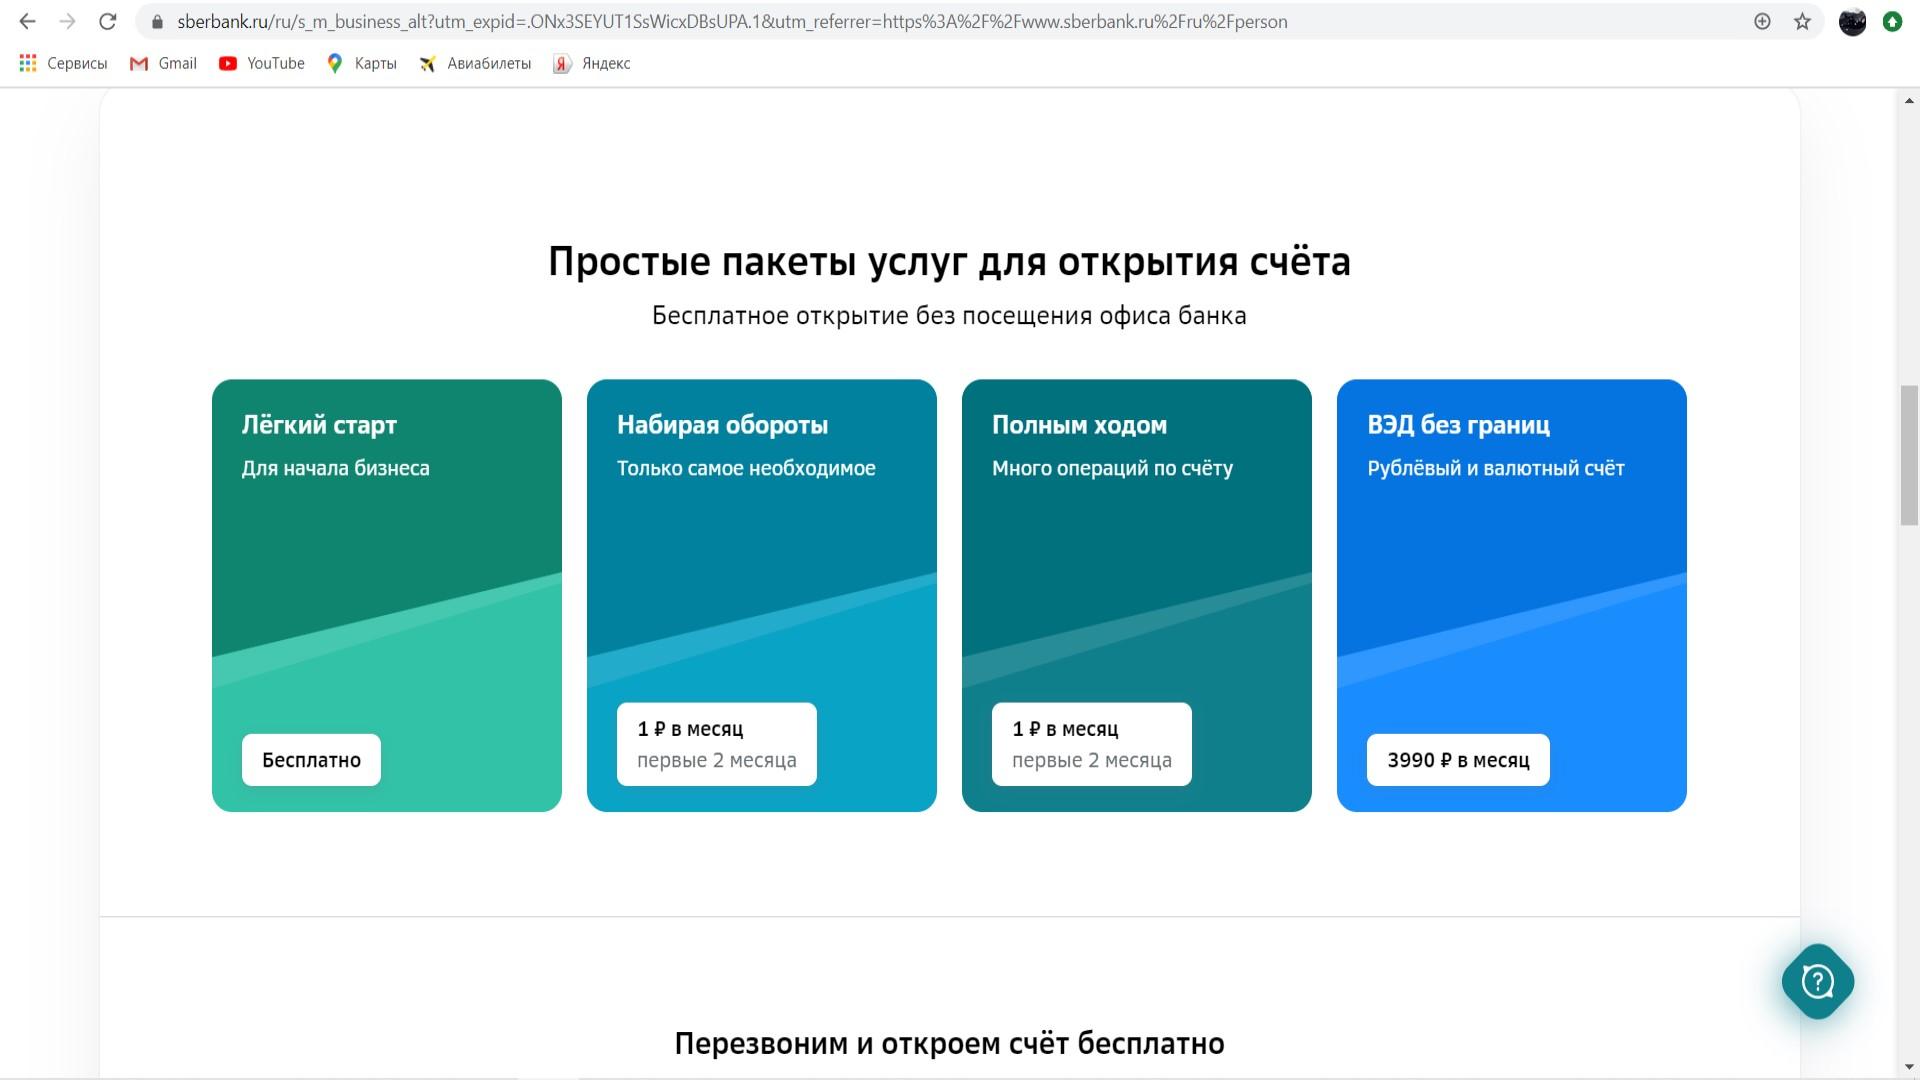 пакеты услуг сбербанк бизнес онлайн